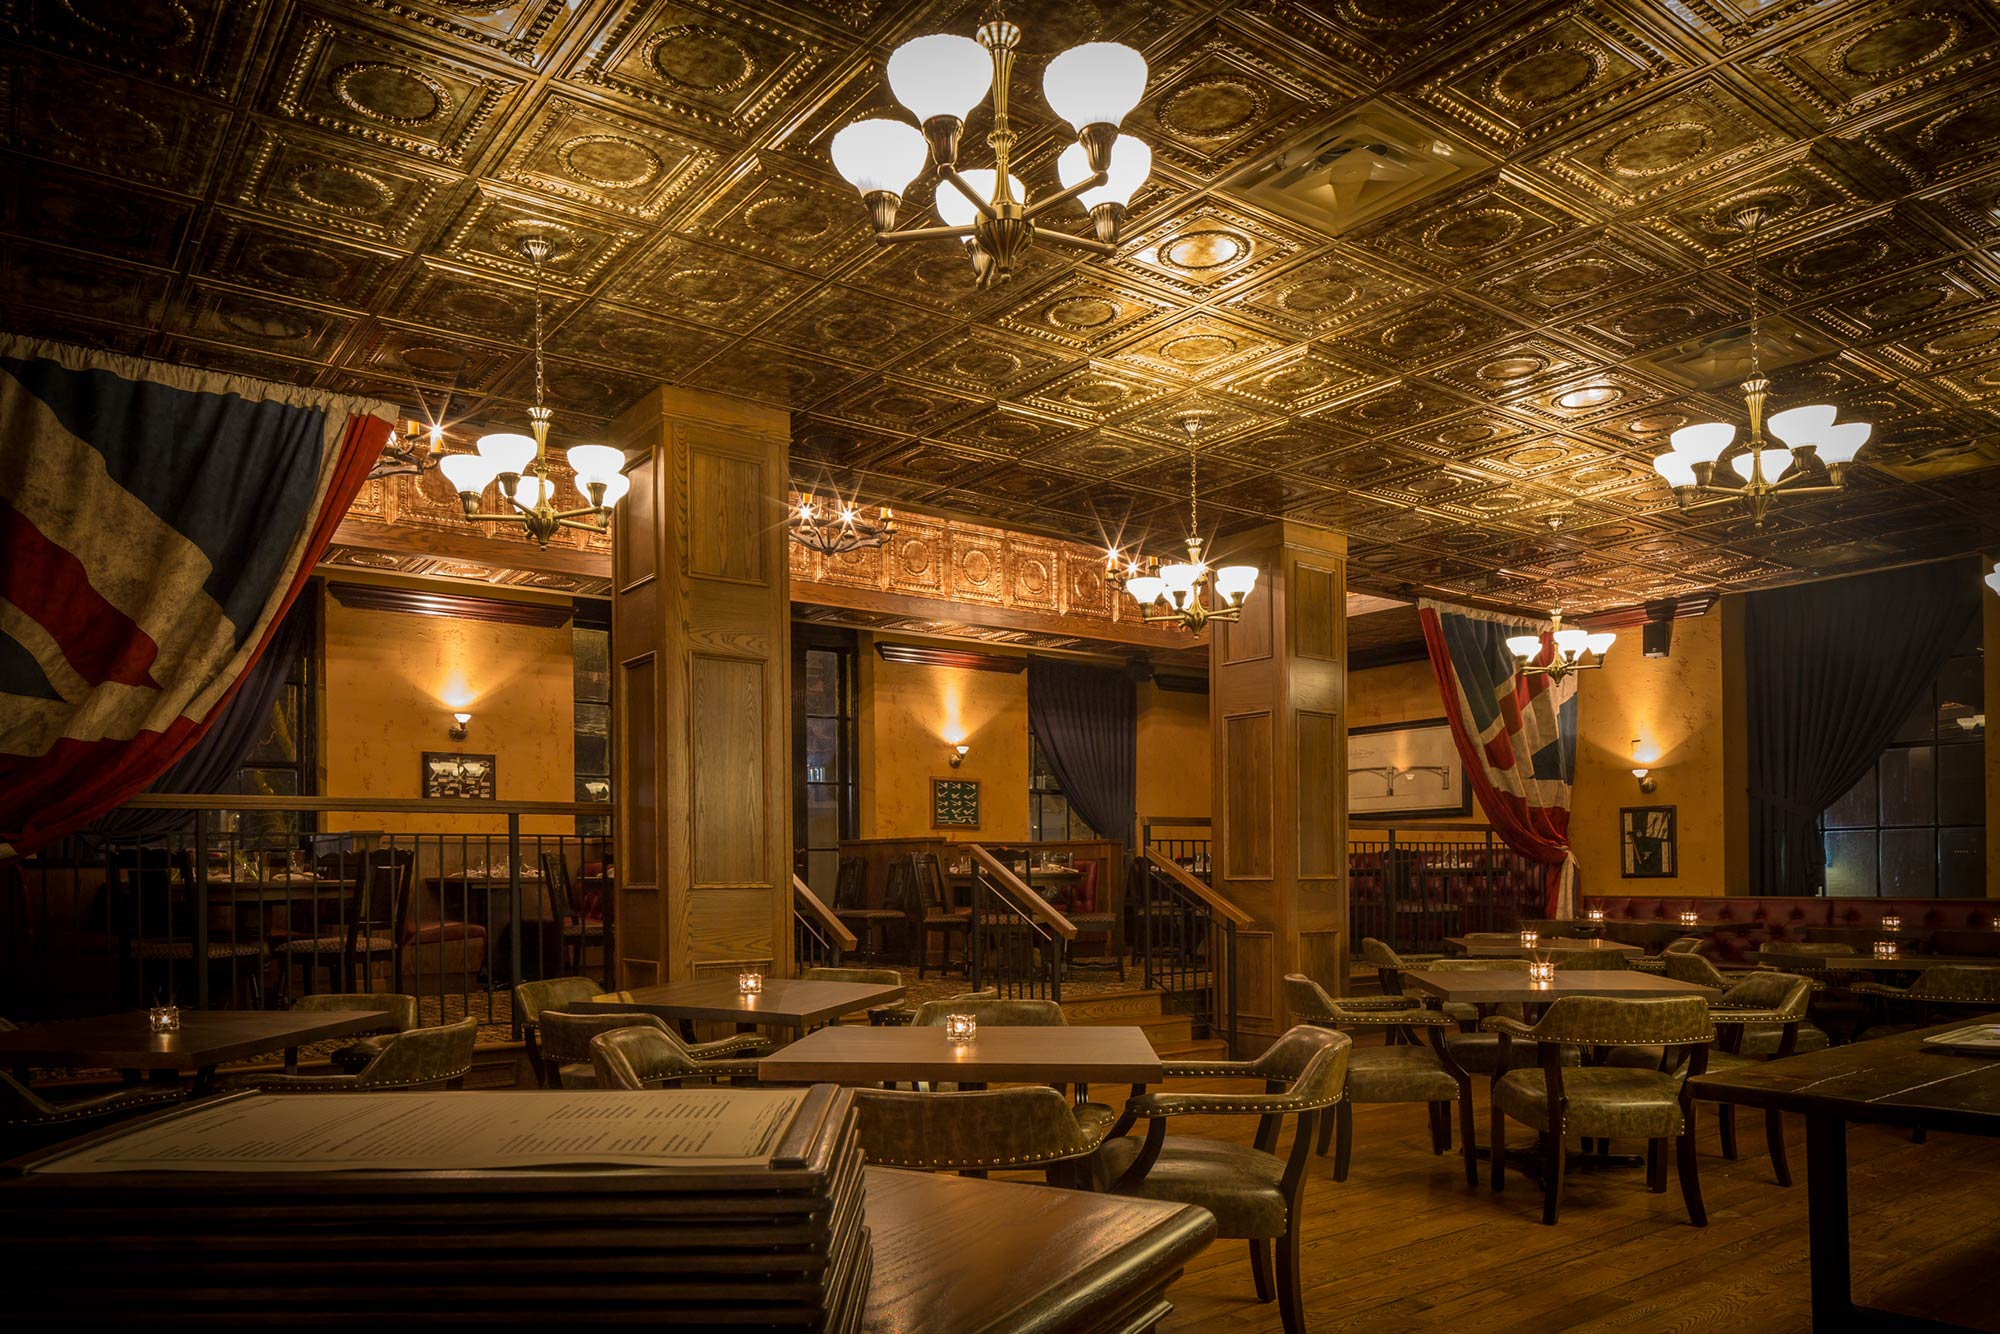 interior-design-restaurant-halifax-dining-room-british-flags.jpg